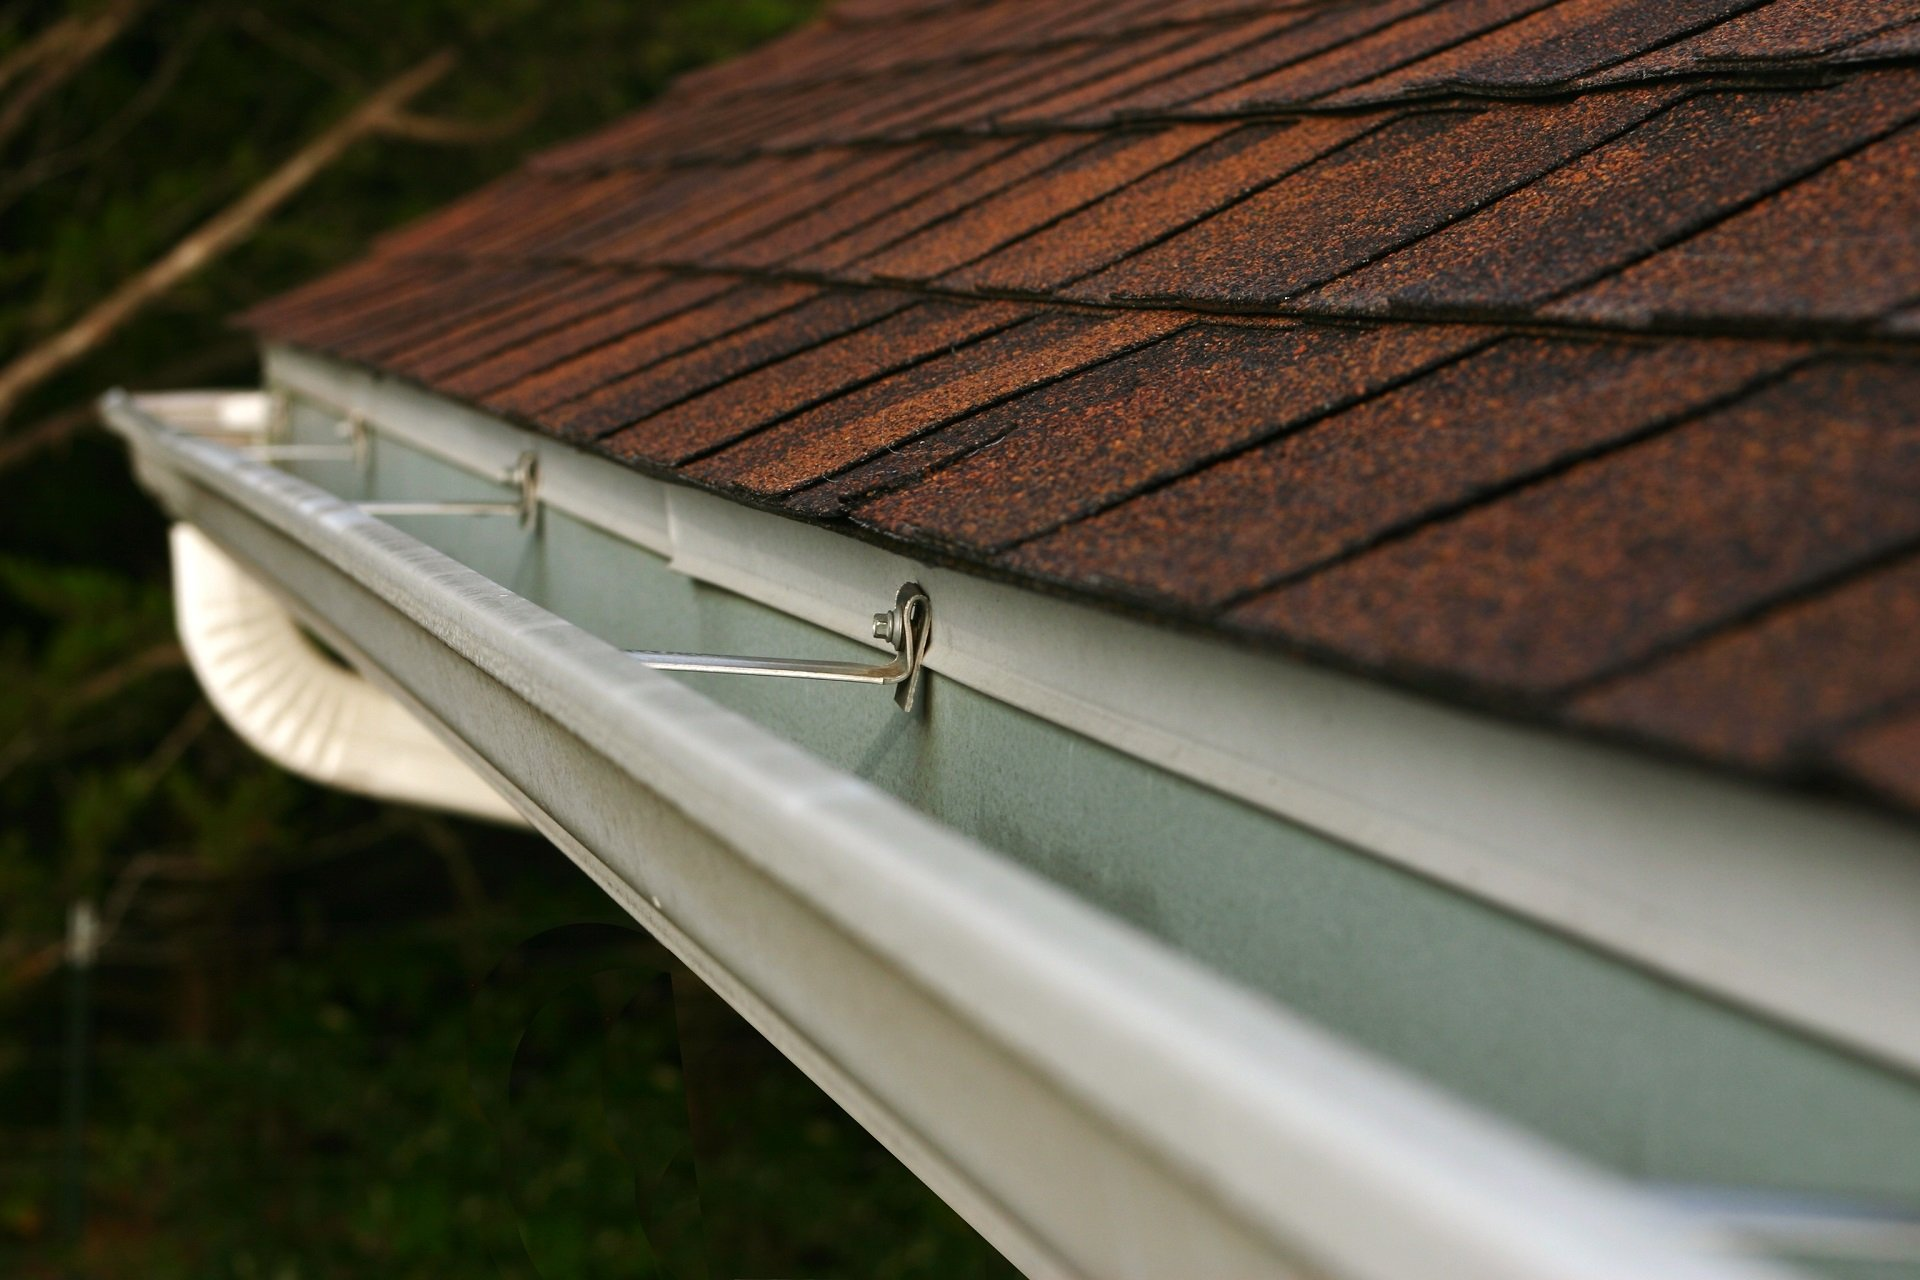 Professional rooftop gutter